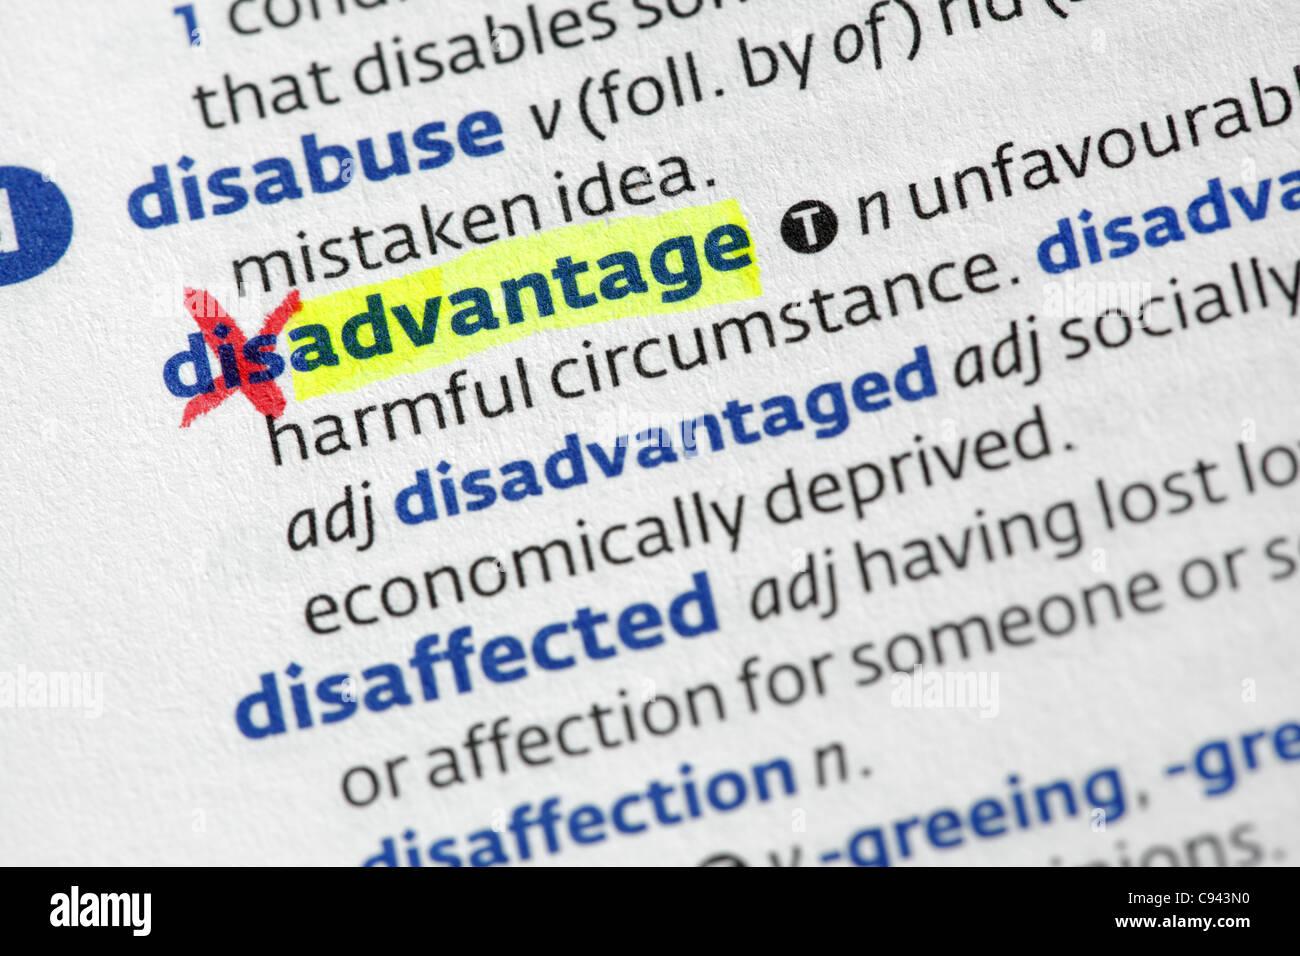 Advantage from disadvantage - Stock Image